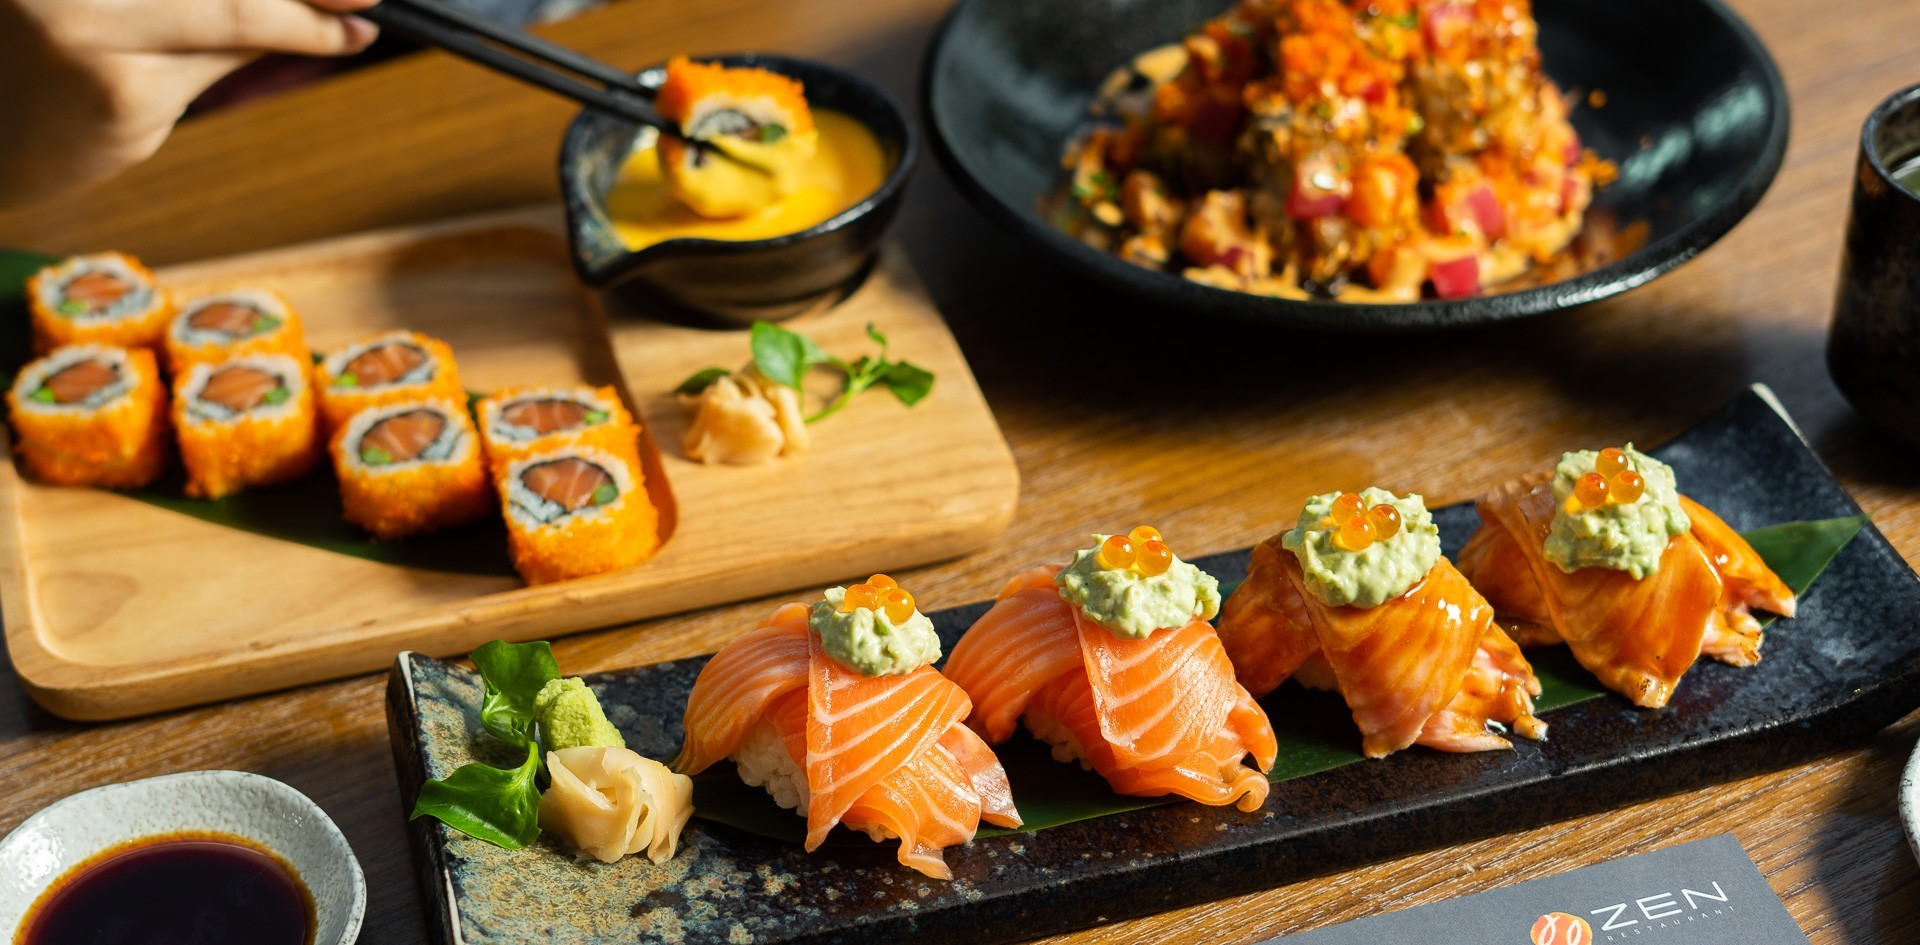 """ZEN"" ร้านอาหารญี่ปุ่นยอดนิยมกับ 3 เมนูใหม่ในแคมเปญ Tokyo Creation"